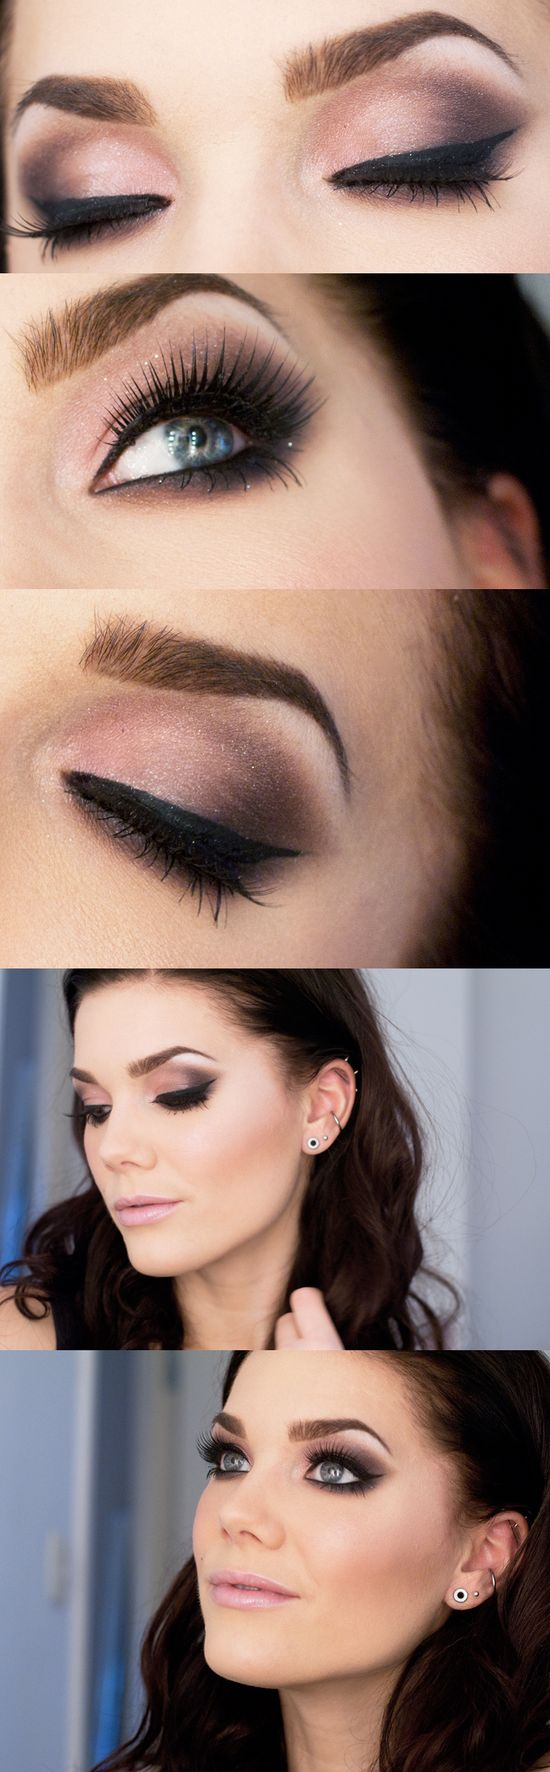 Today's Look – Earth Invasion  Linda Hallberg – makeup artist